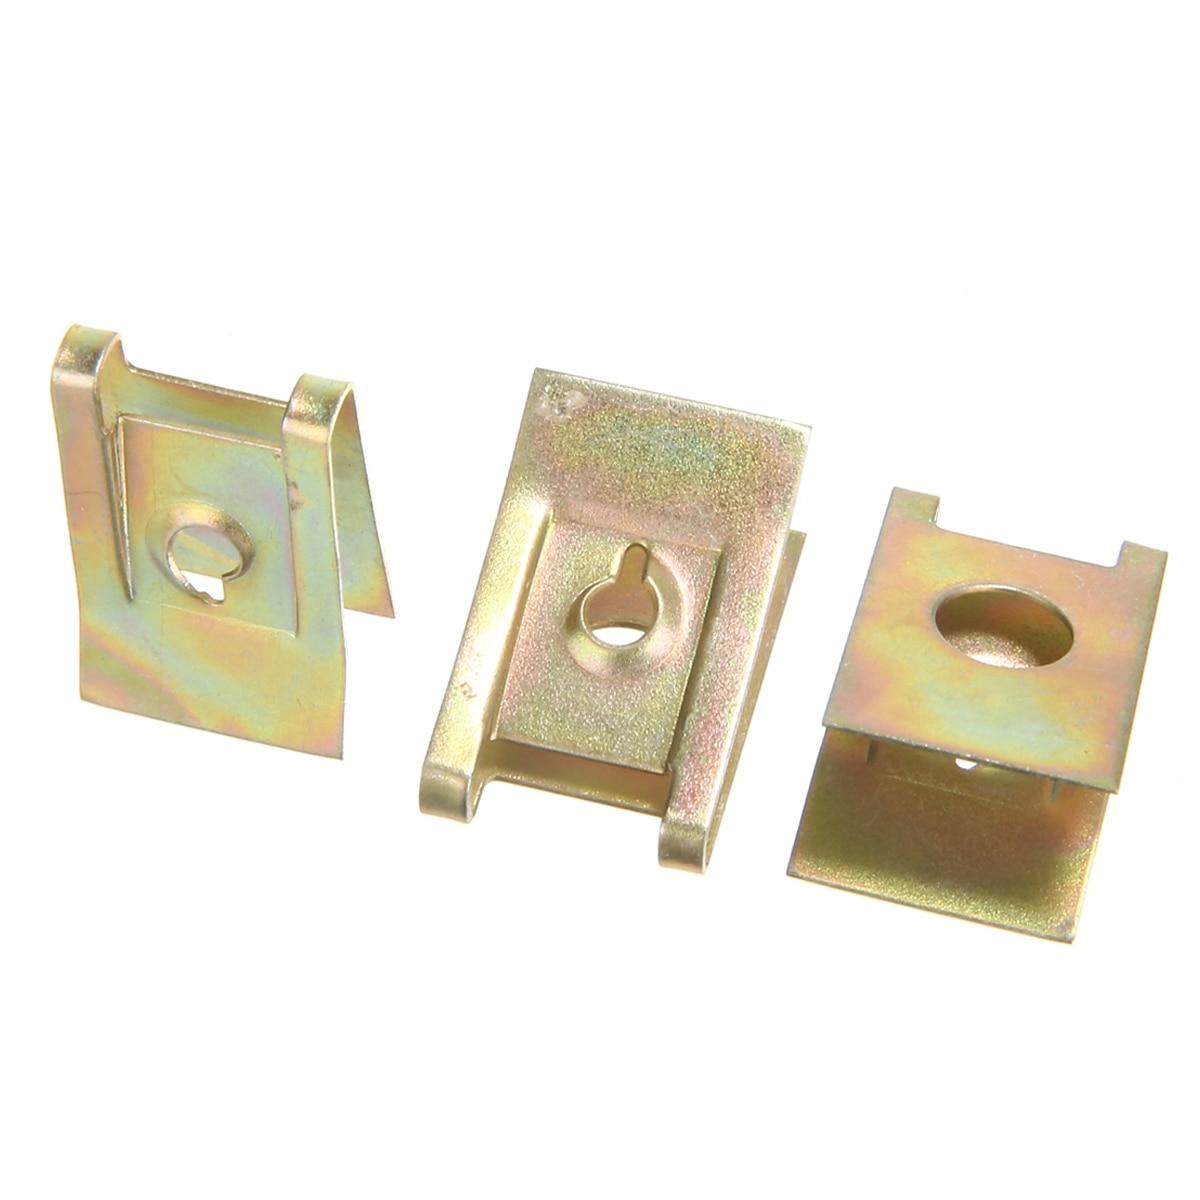 10Pcs 6mm Brass Tone Metal Rivets Fender Trunk Retainer Fastener Clip for Car